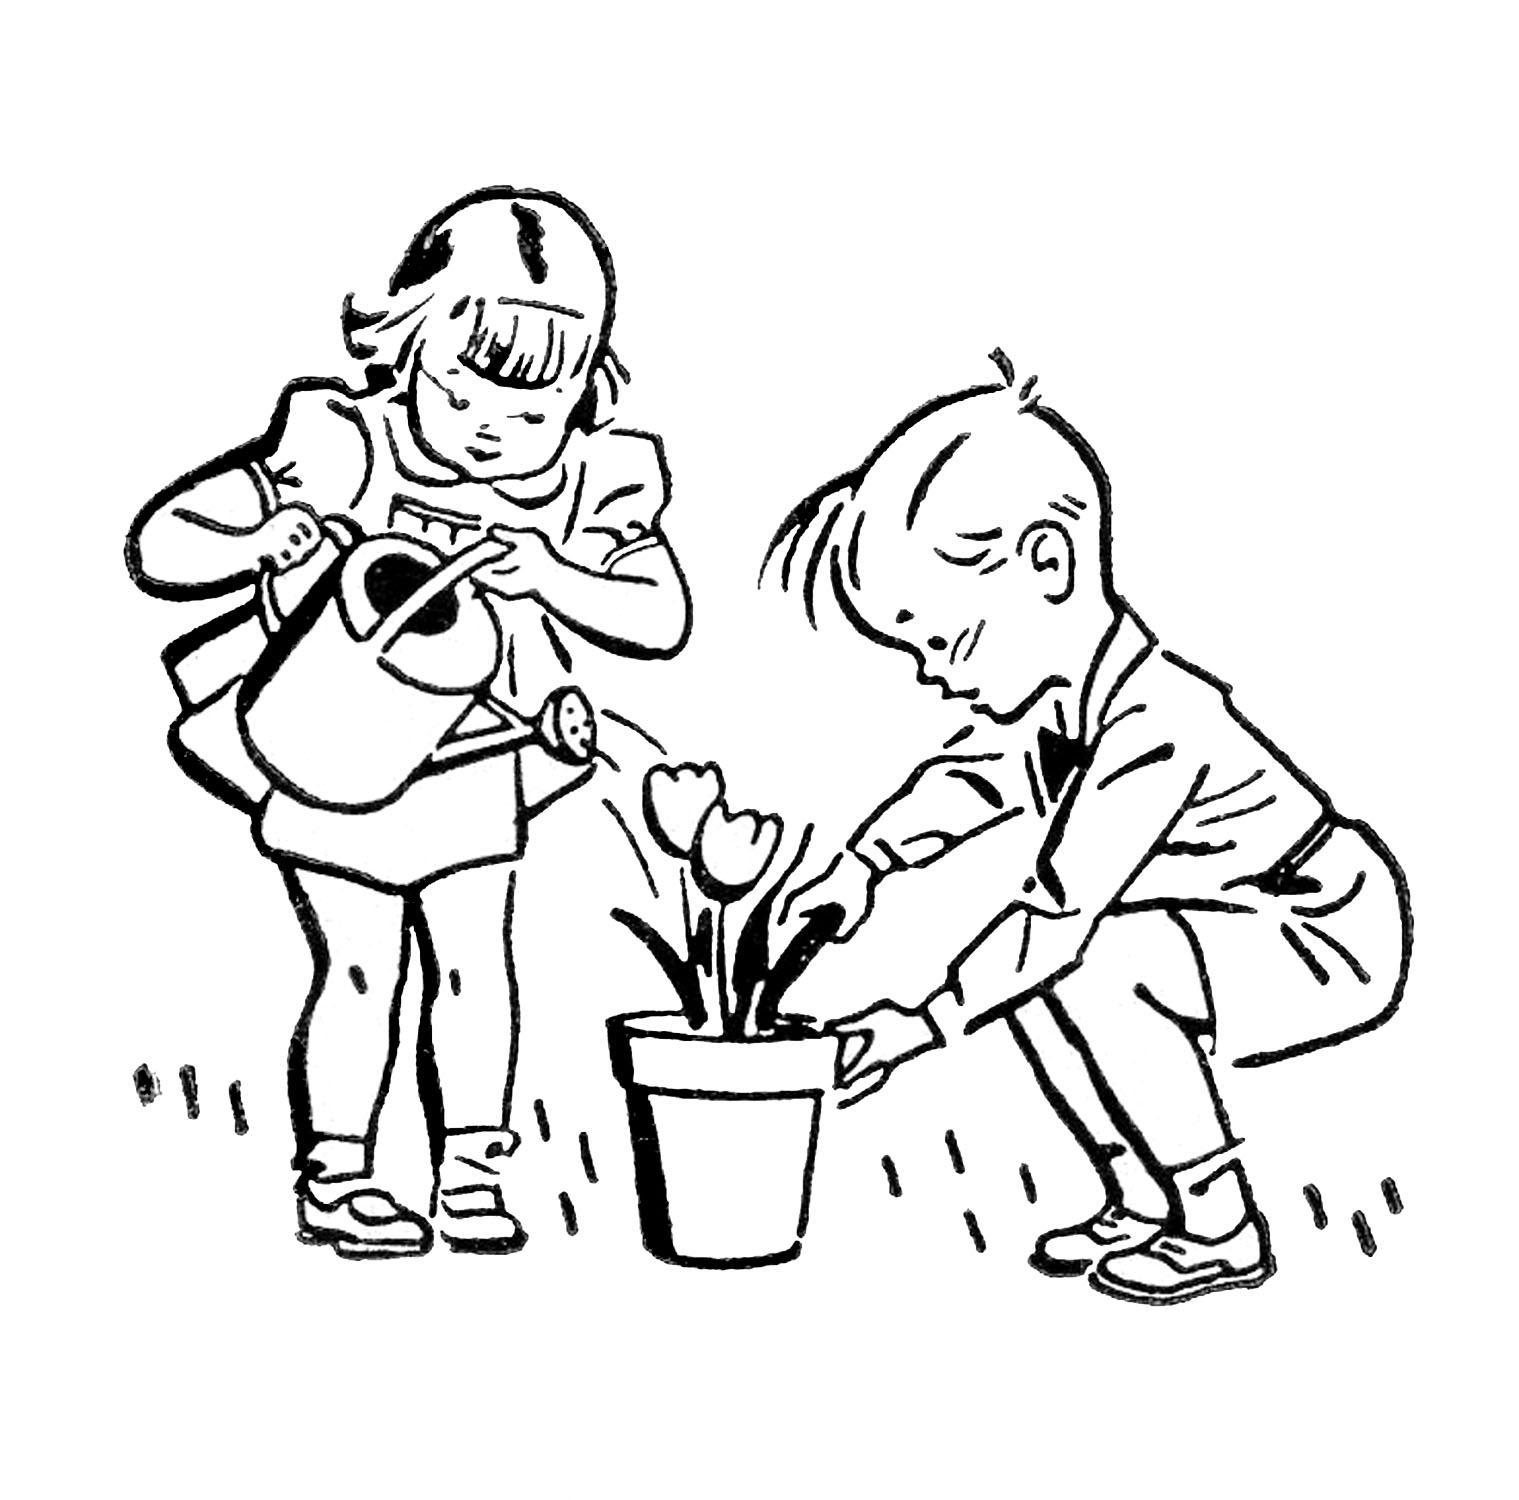 Ретро градинарски клипарти # 3076140